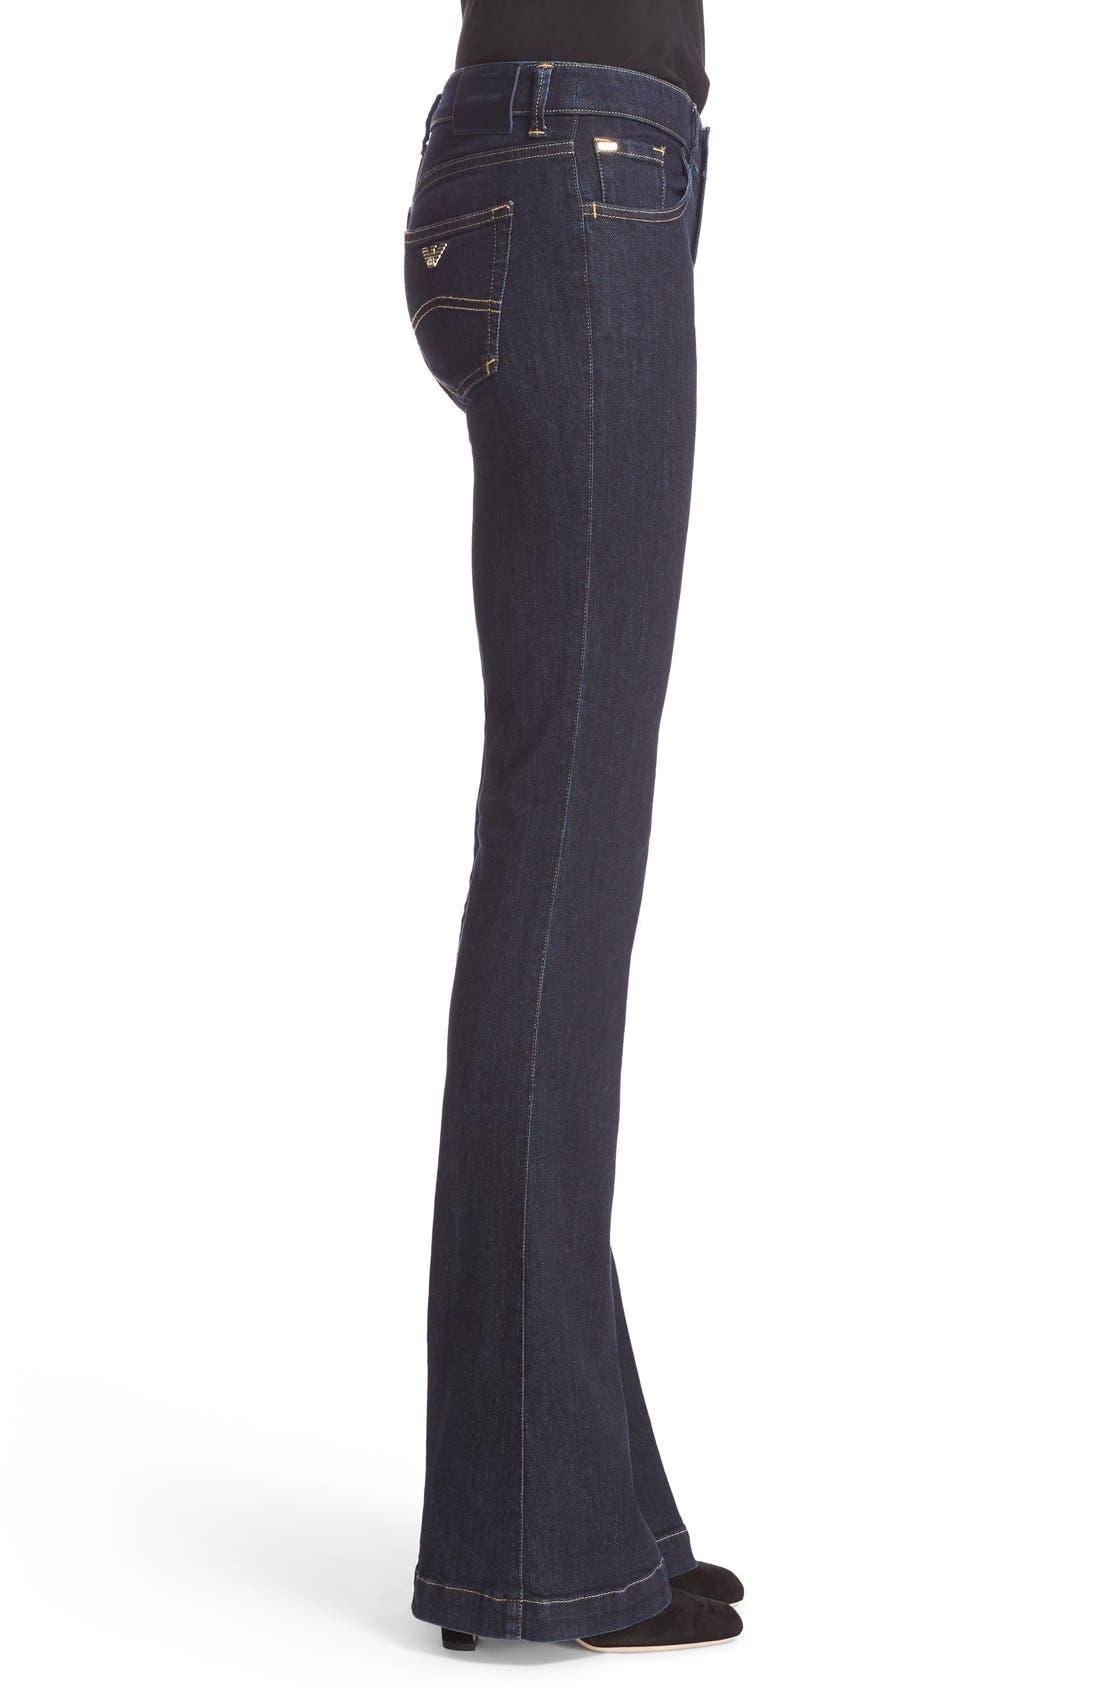 Armani Jeans Bootcut Jeans,                             Alternate thumbnail 2, color,                             400